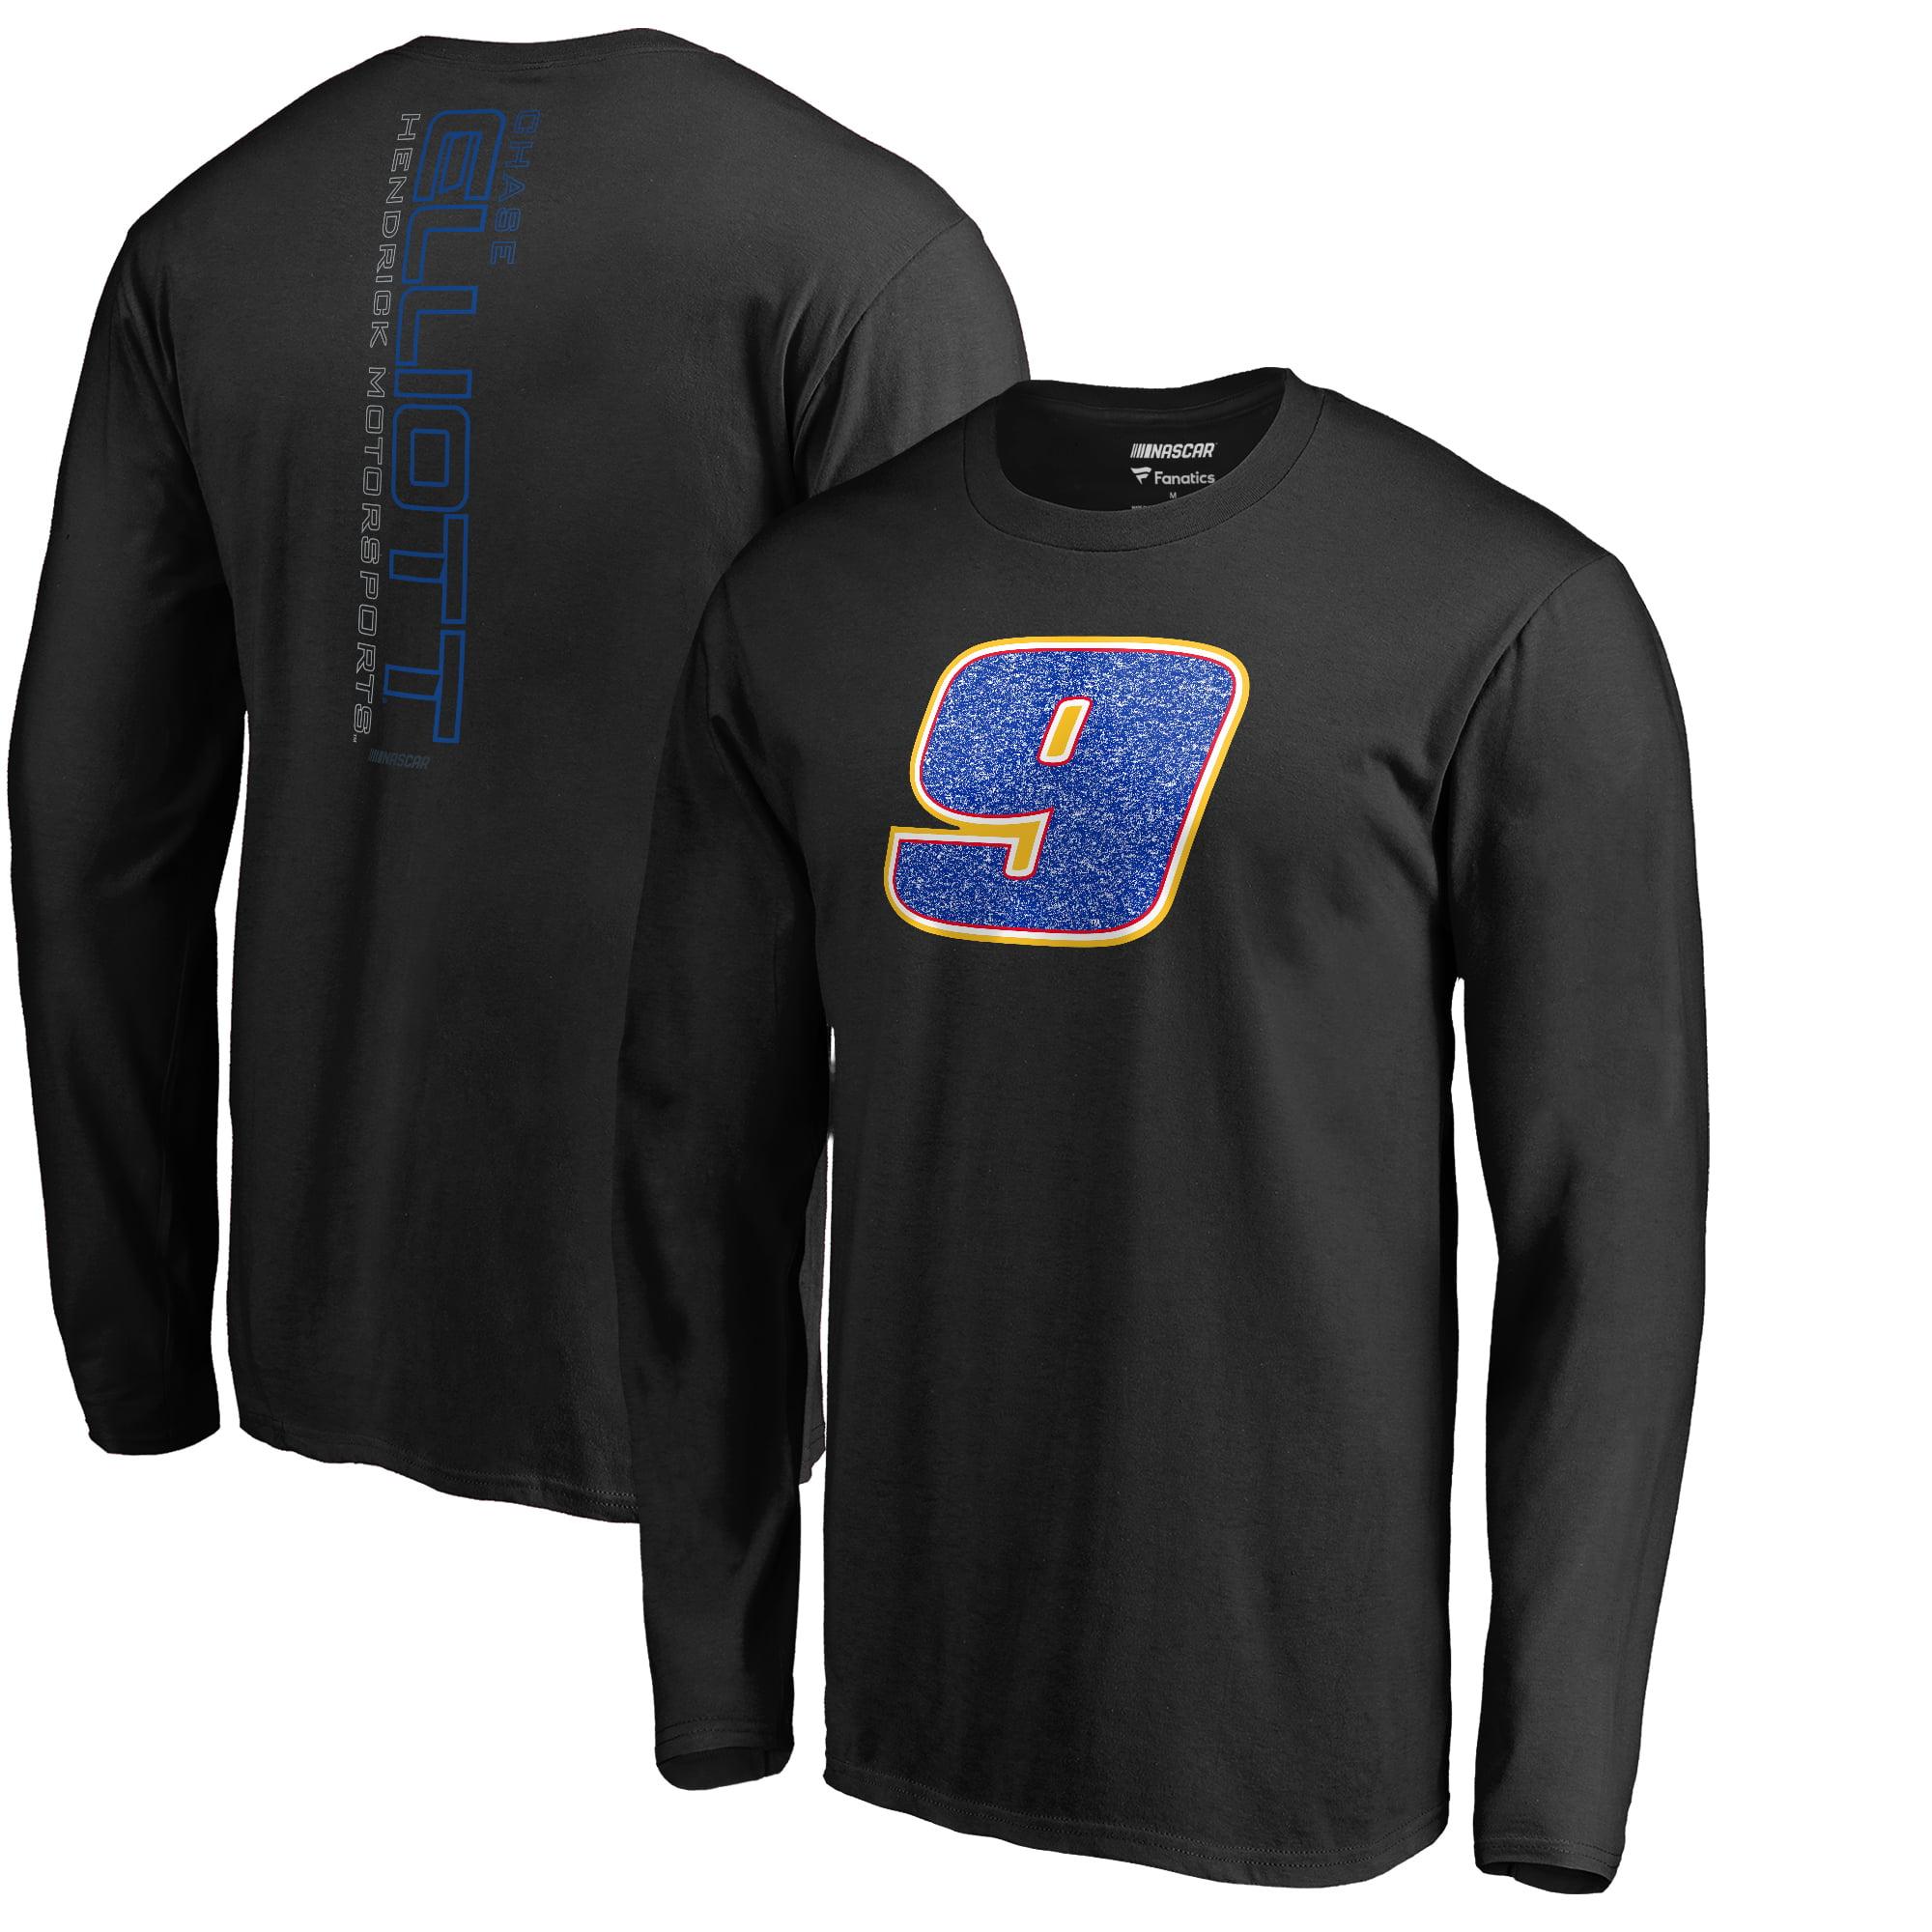 Chase Elliott Fanatics Branded Static Long Sleeve T-Shirt - Black